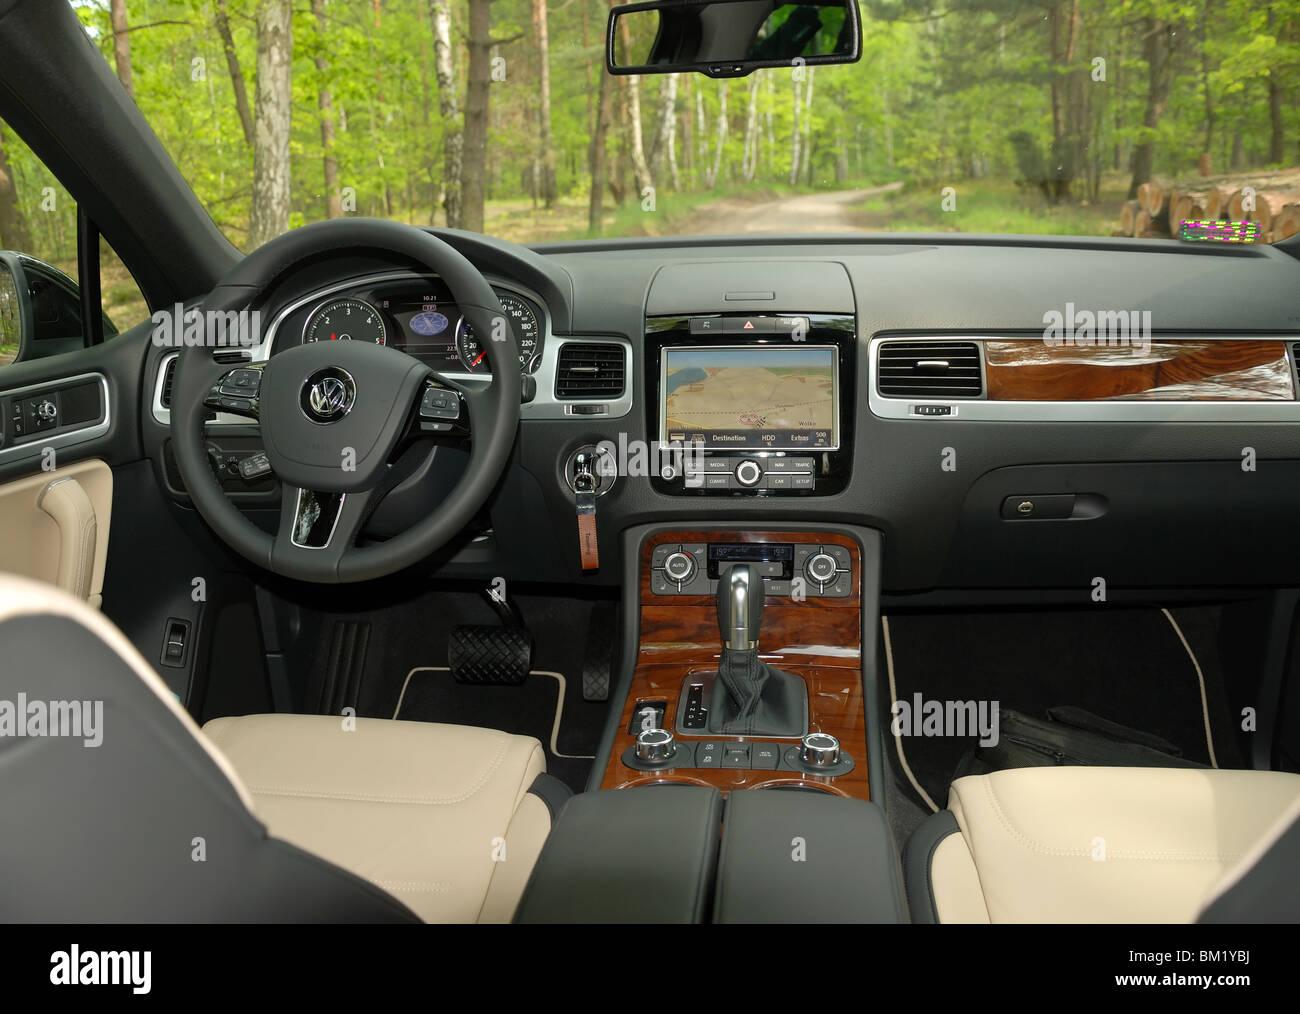 Volkswagen Touareg Stockfotos & Volkswagen Touareg Bilder - Alamy